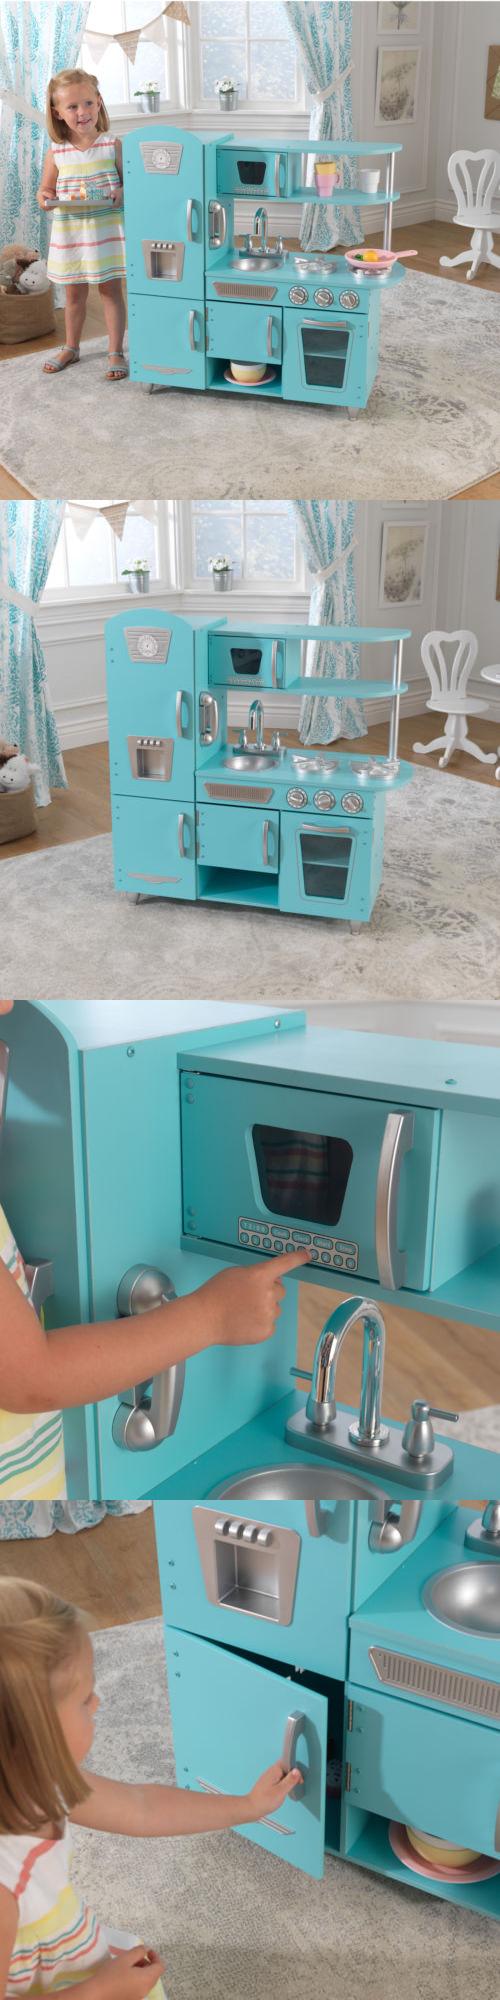 Awesome Buy Kidkraft Kitchen Image - Modern Kitchen Set - dietmania.info